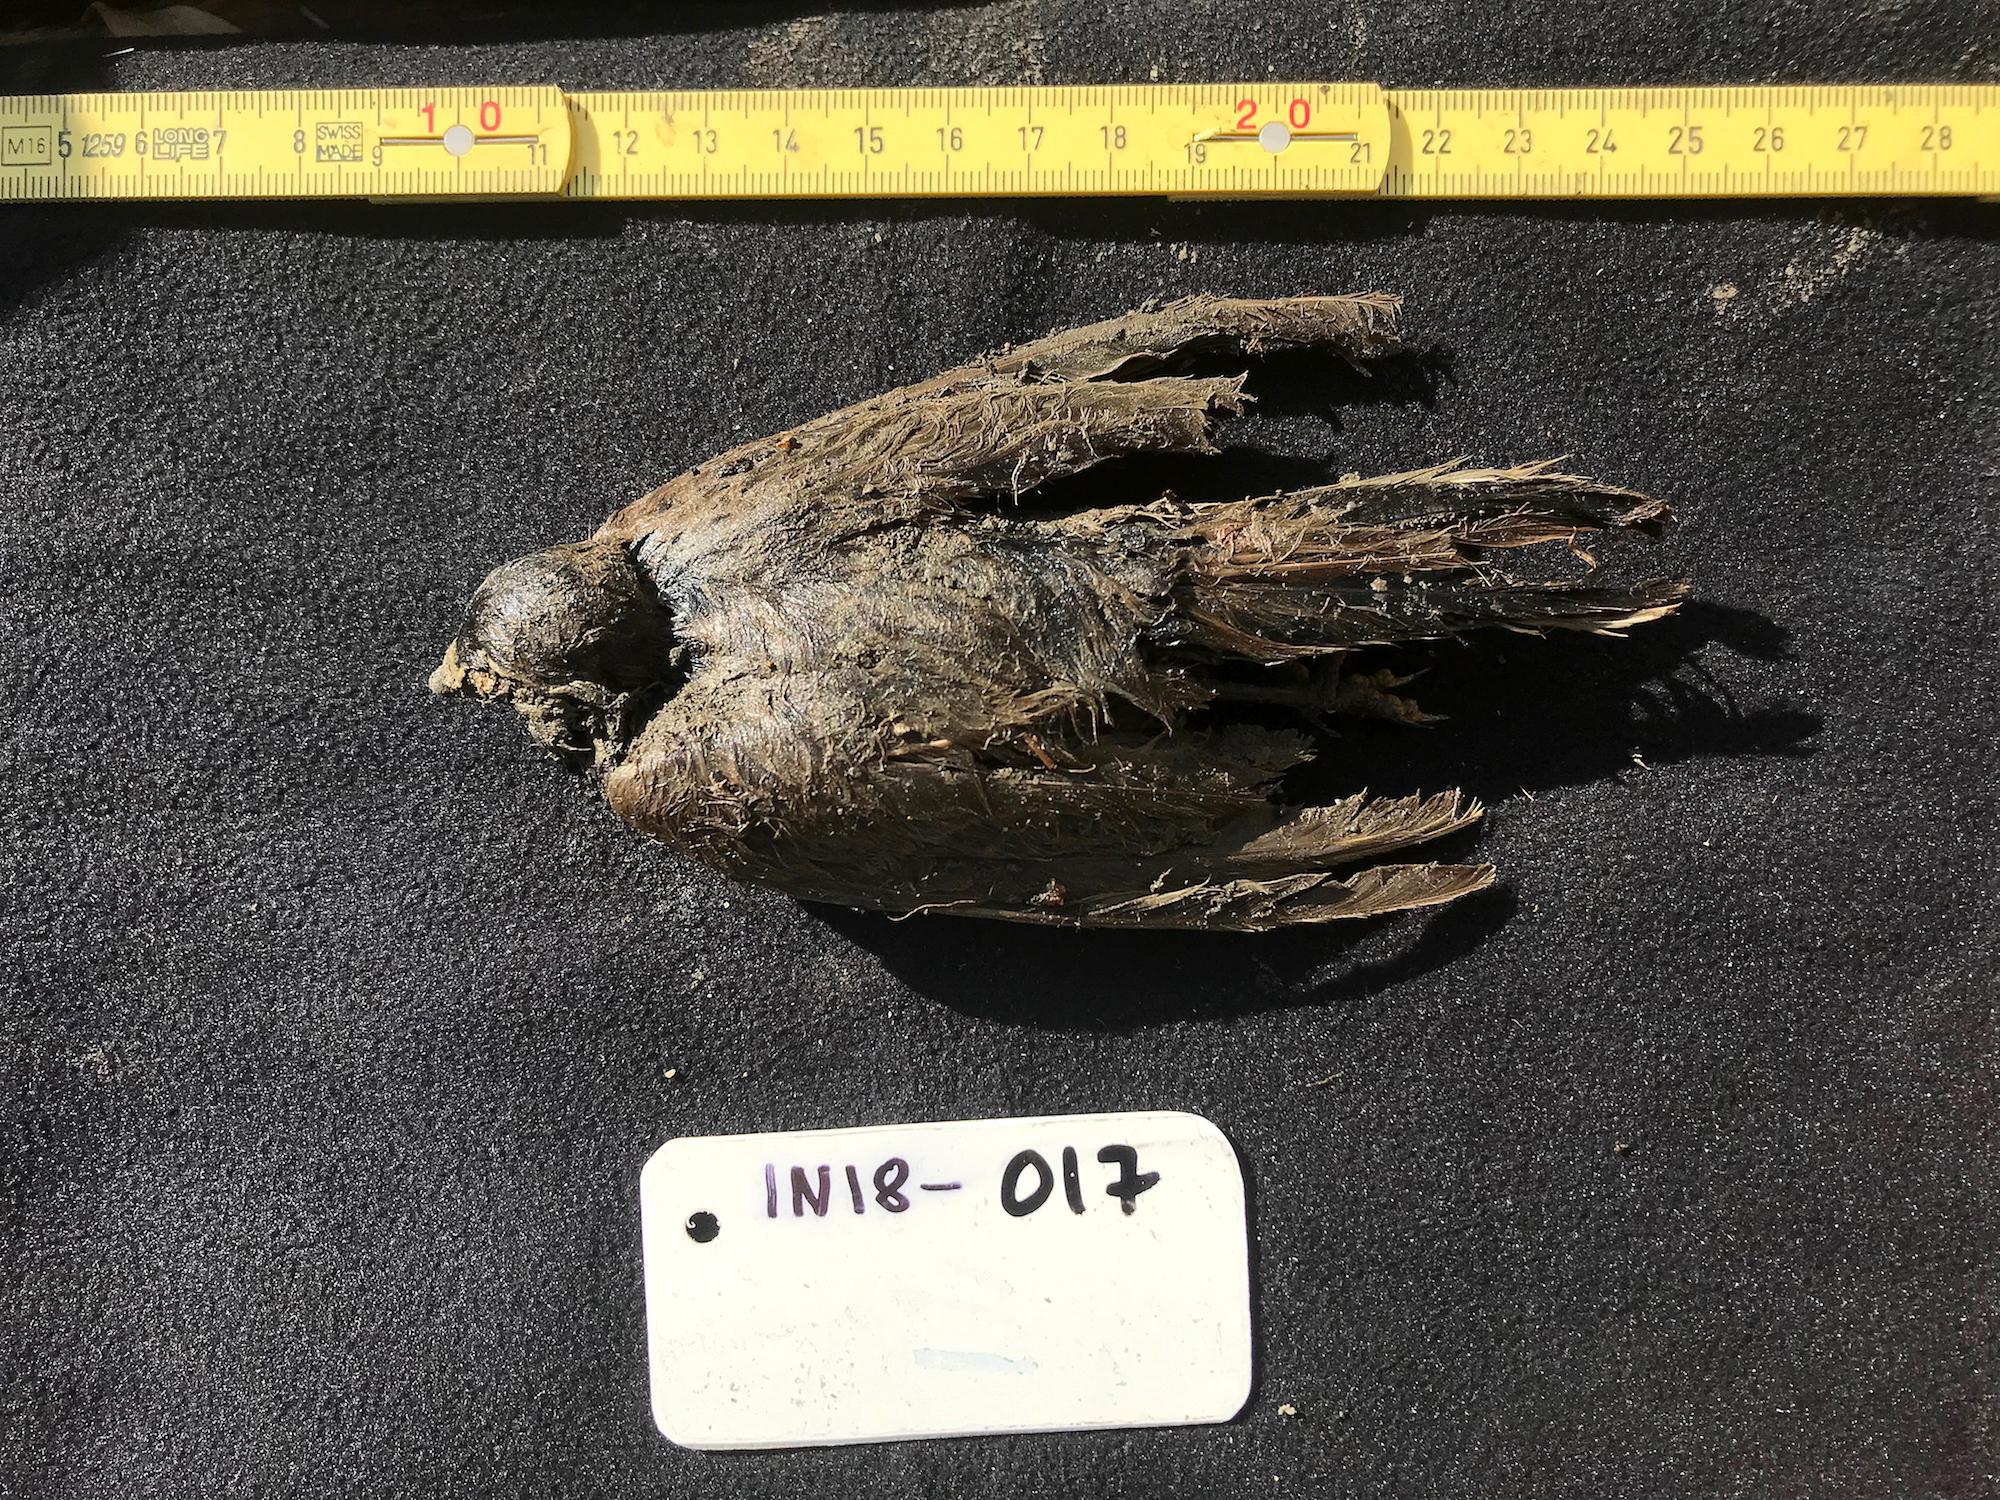 46 000 Year Old Bird Frozen In Siberian Permafrost Looks Like It Died A Few Days Ago Live Science